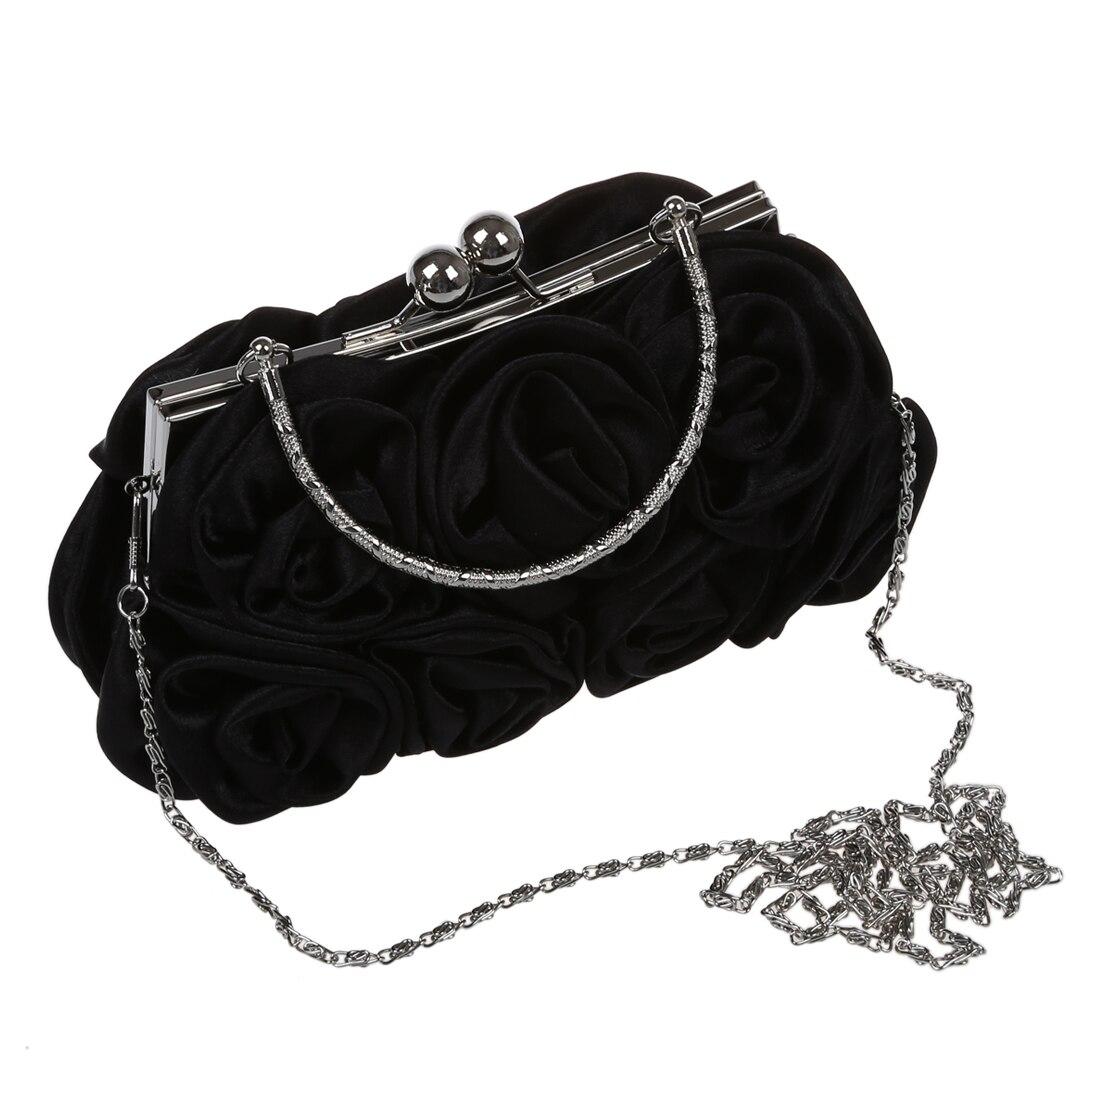 5pcs of  Rosette Clutch Bag Evening Black Flower Purse Handbag Banquet Bag 5 pcs of p